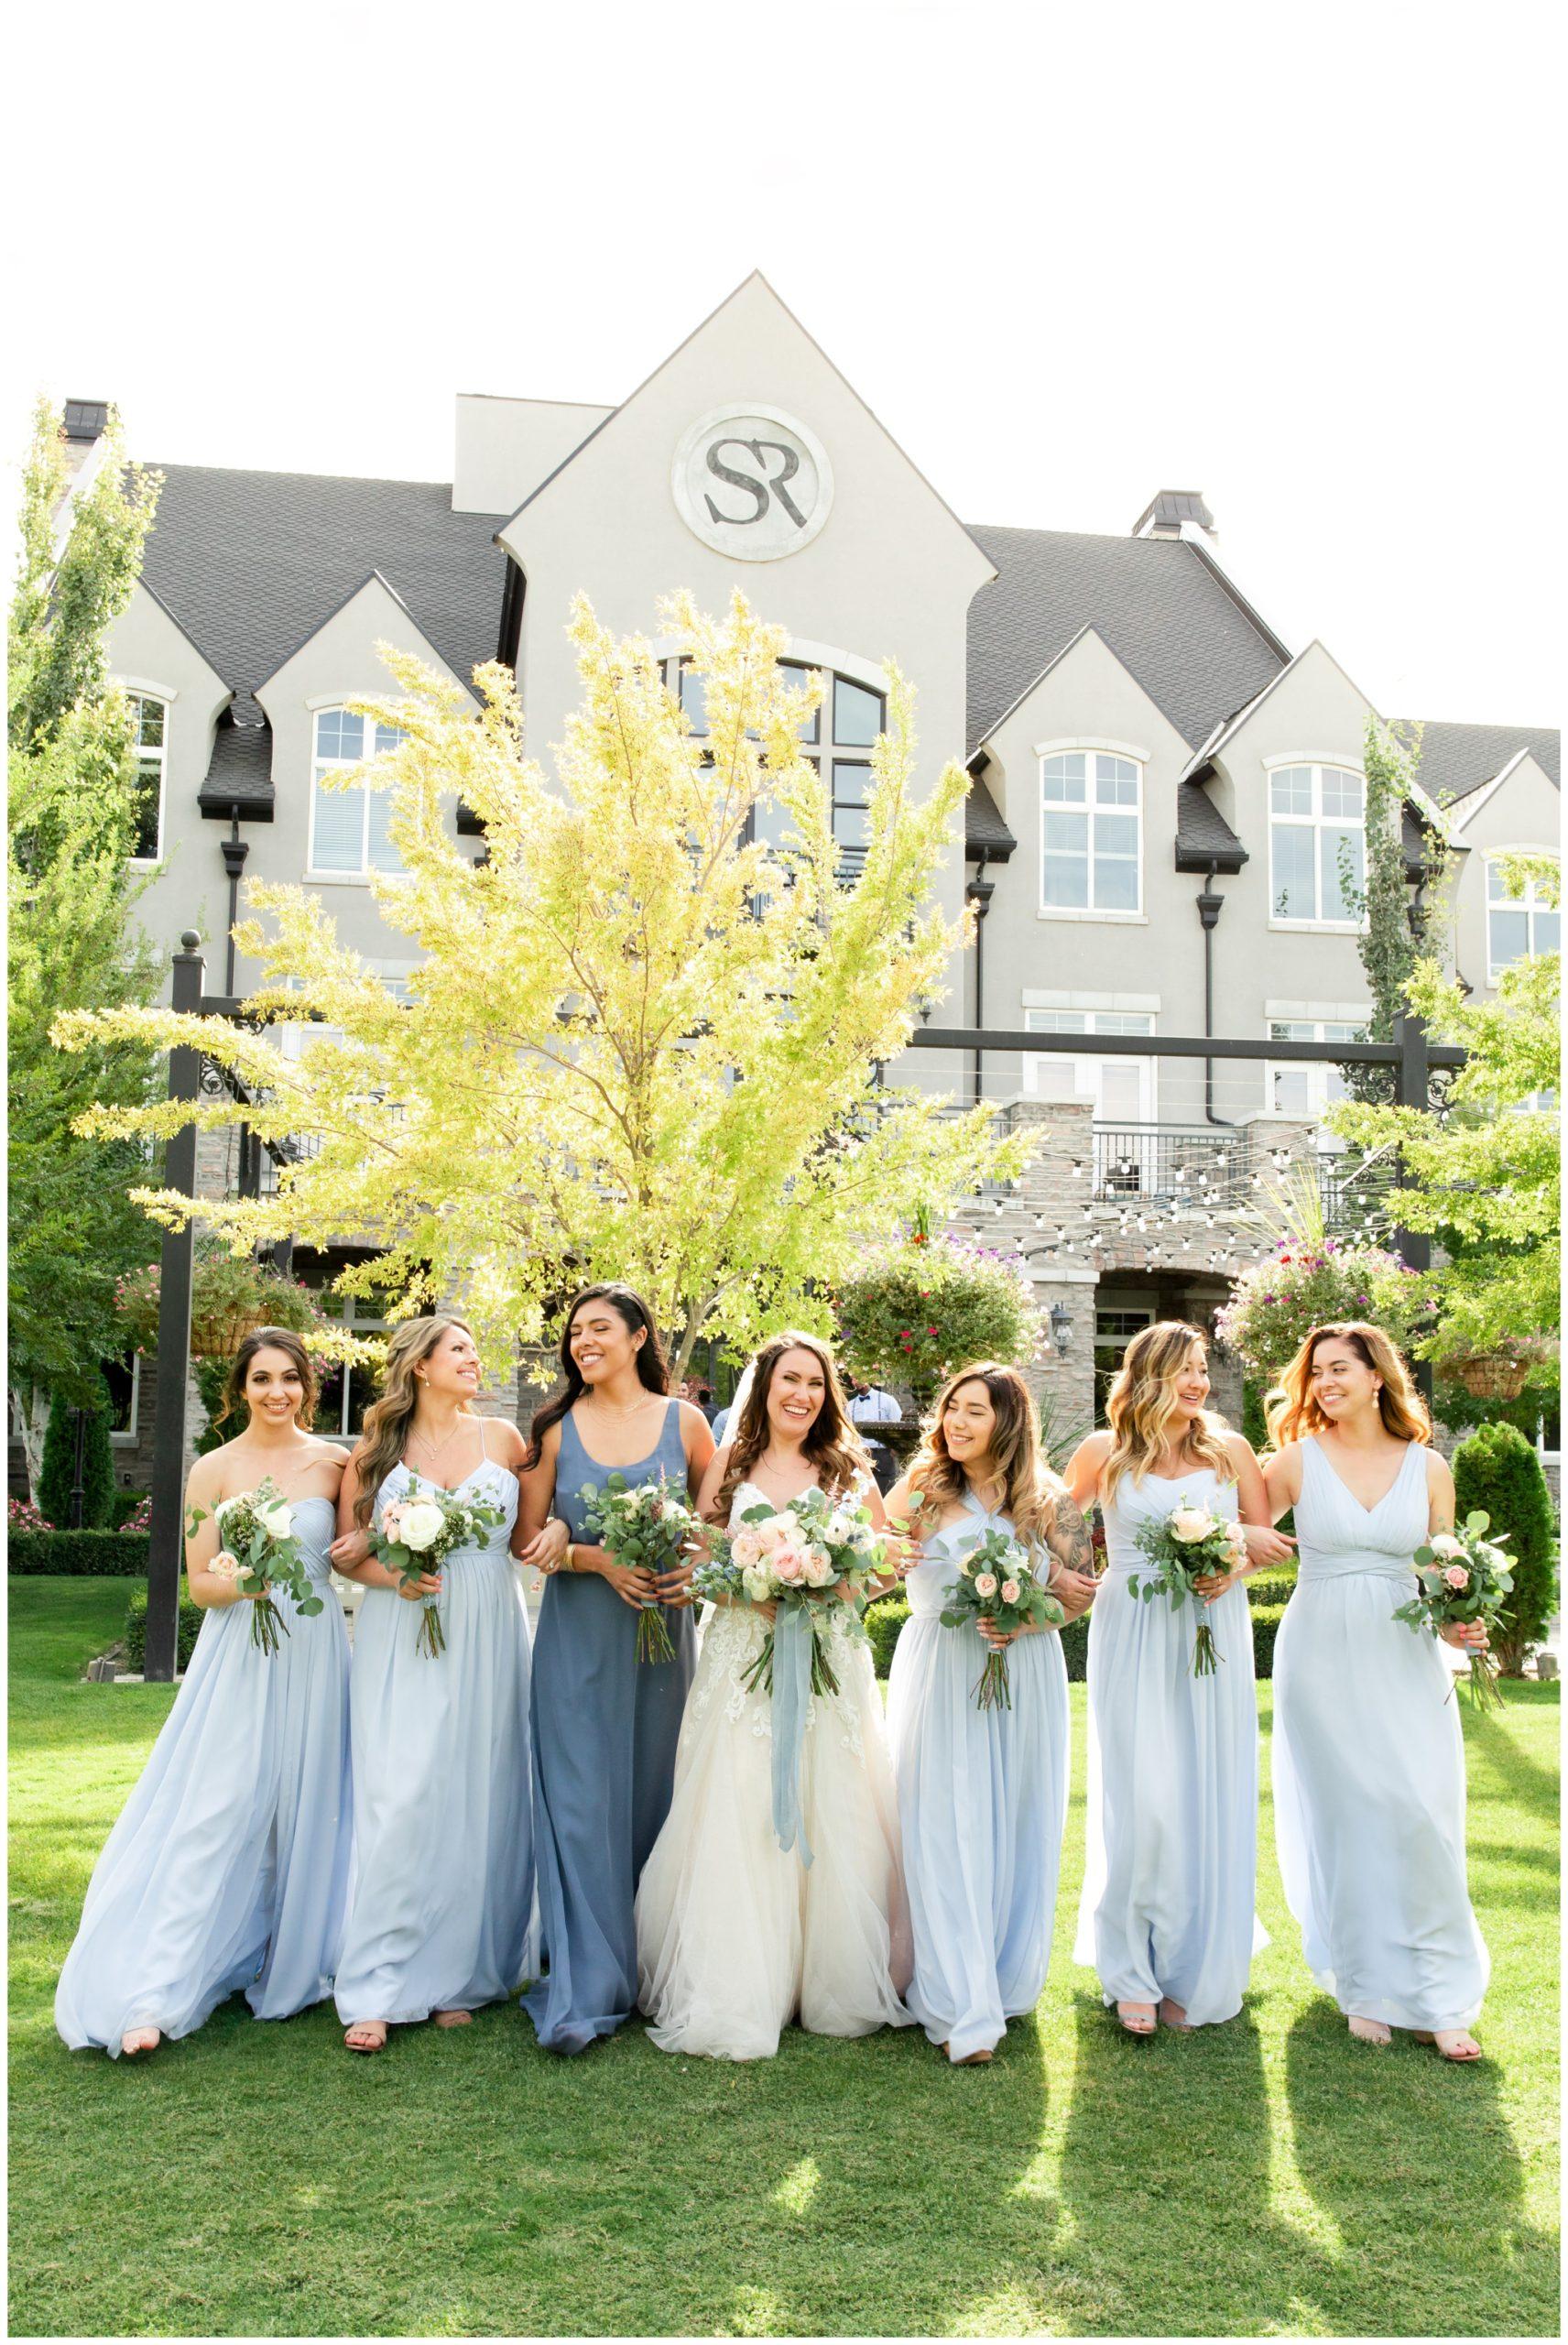 Bridesmaids wearing light blue dresses at wedding in Utah